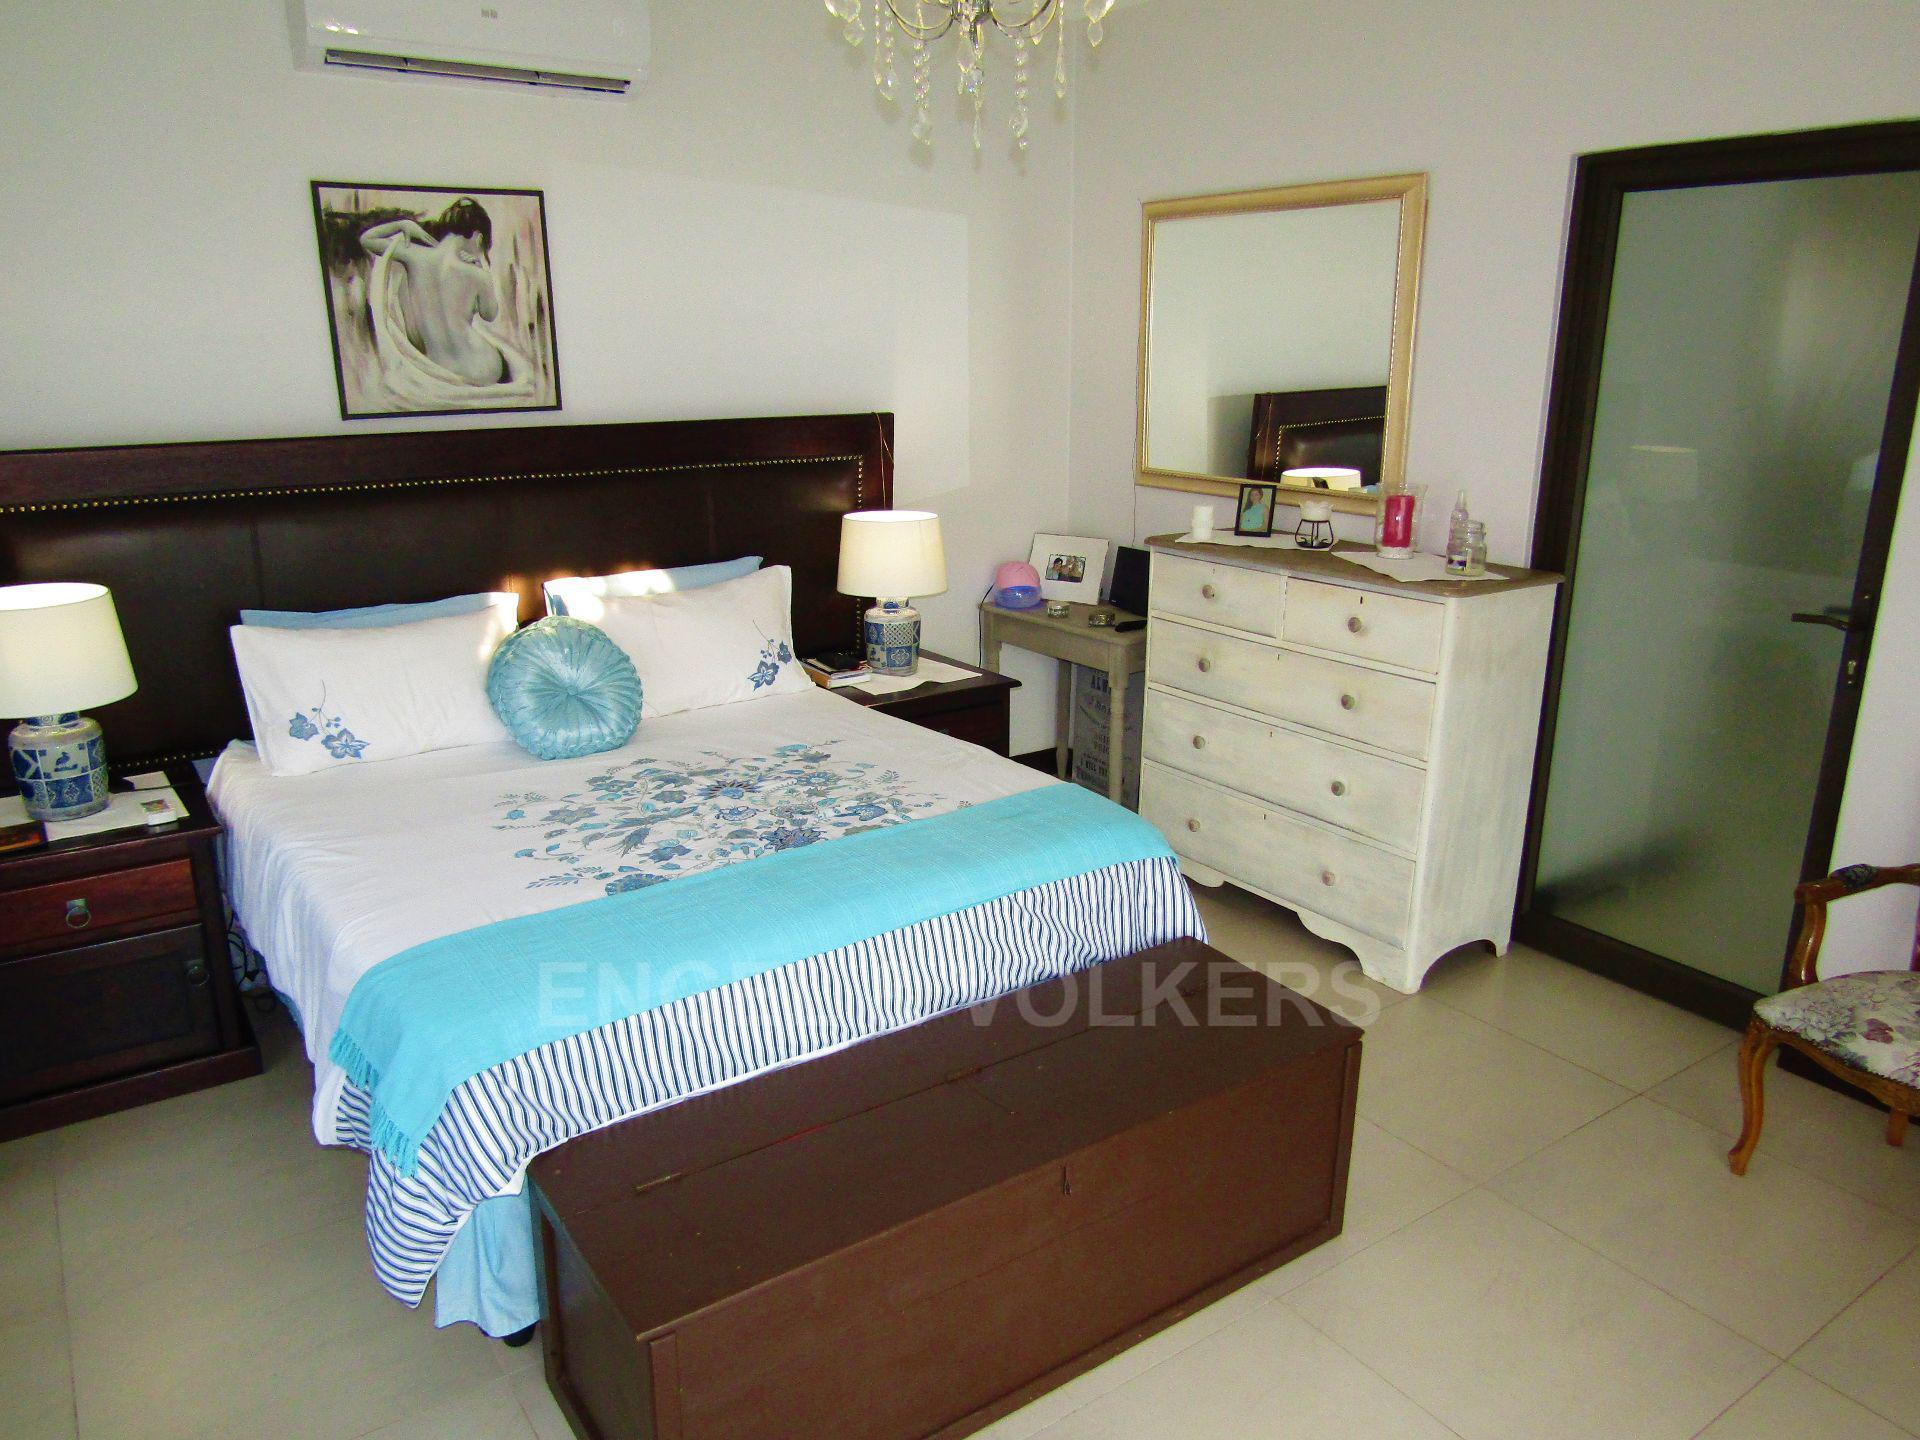 Lifestyle Estate property for sale. Ref No: 13458759. Picture no 14